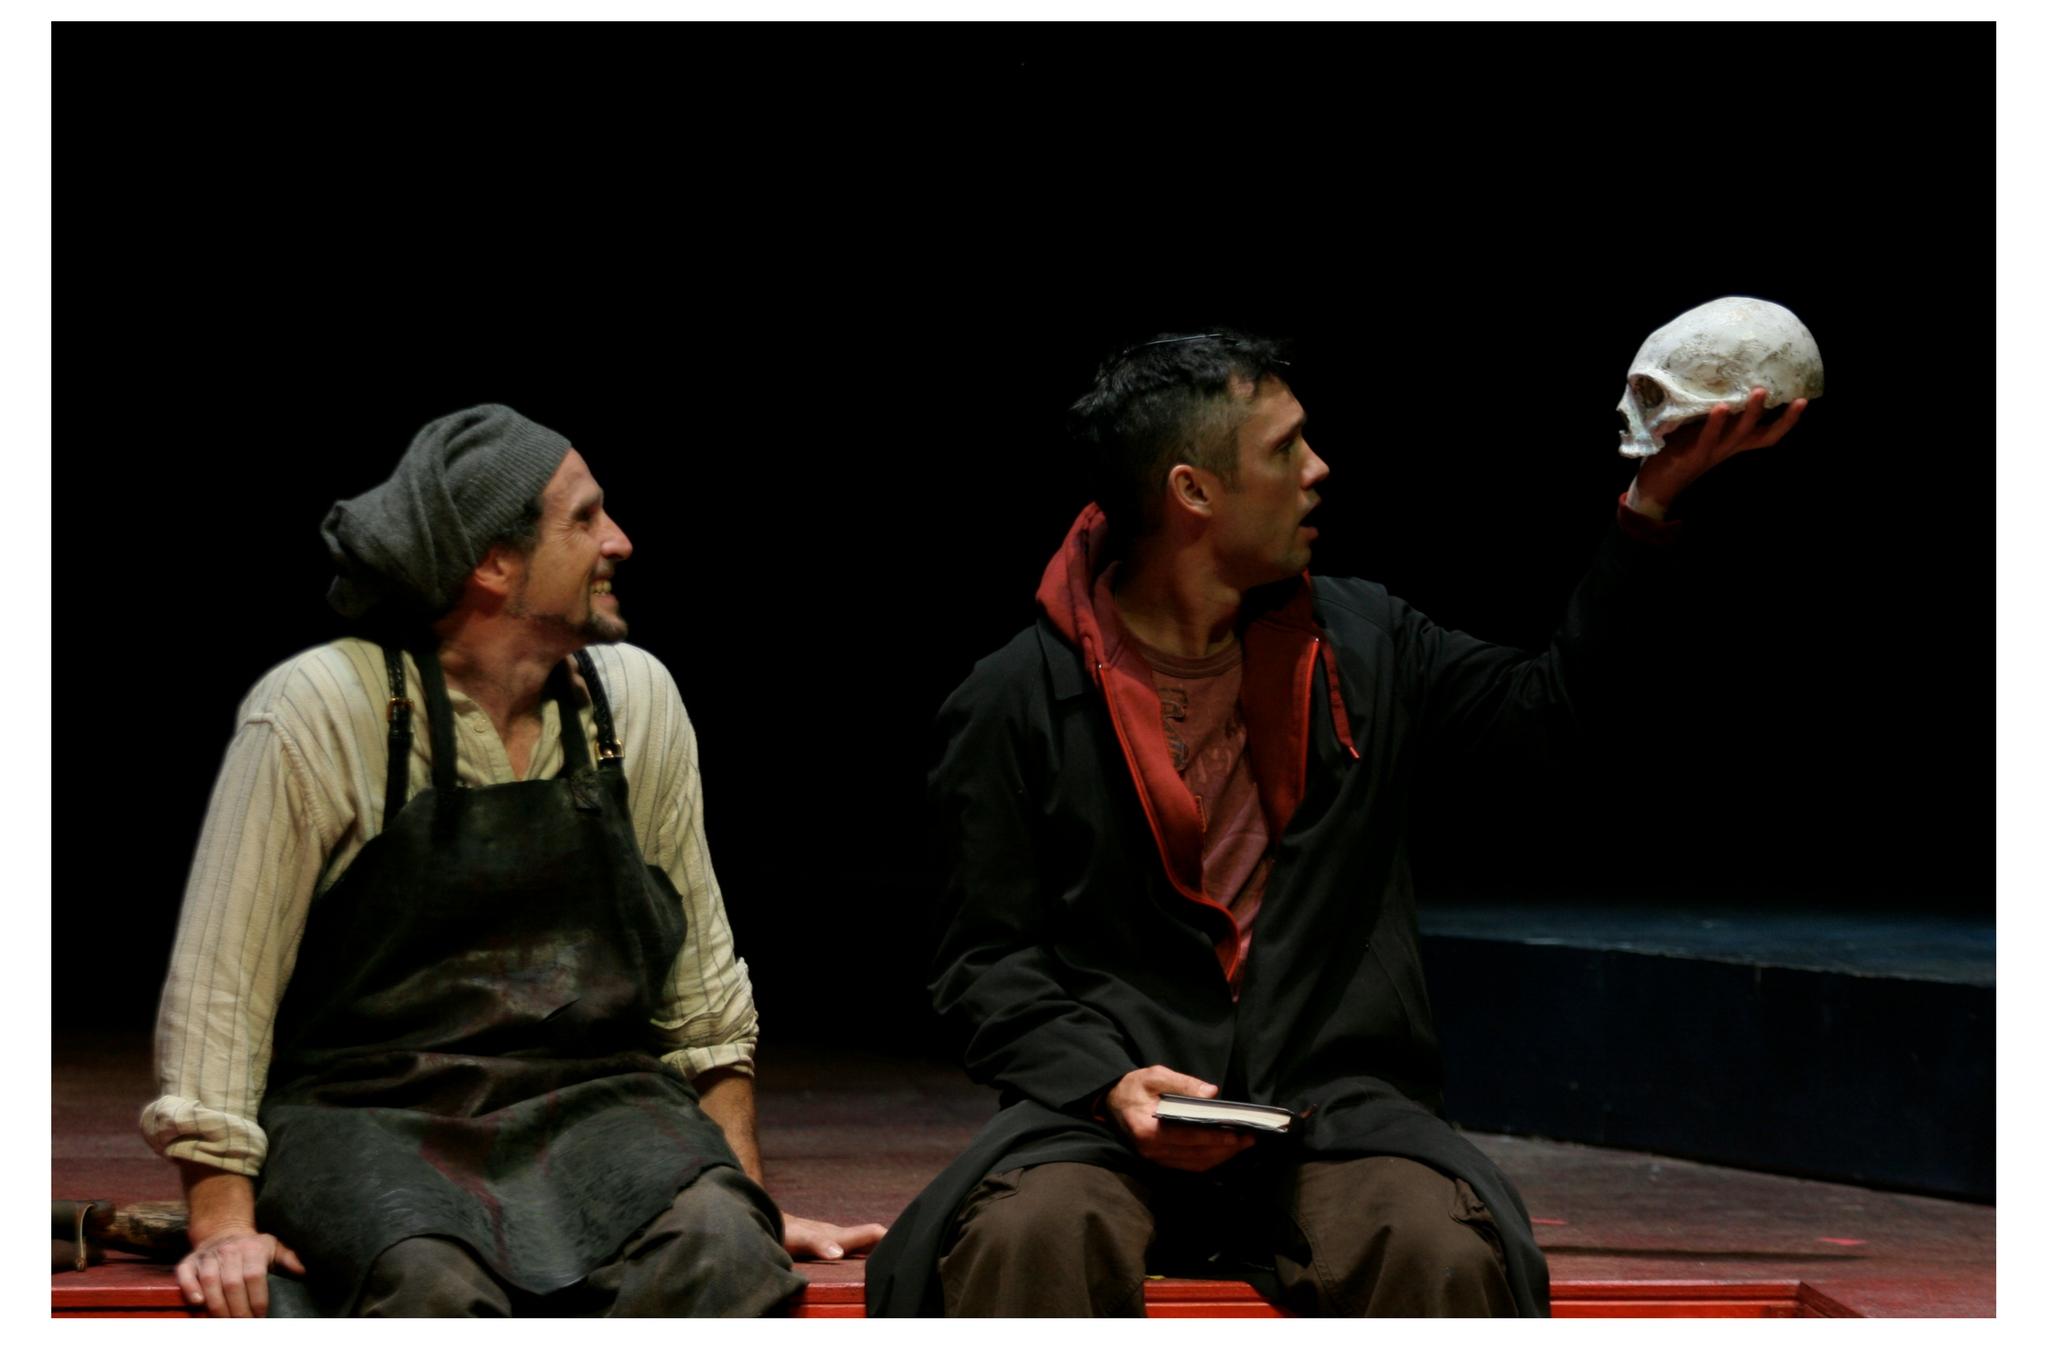 Jeremiah Kissel (Gravedigger) and Jeffrey Donovan (Hamlet) in Hamlet, Shakespeare on the Common 2005